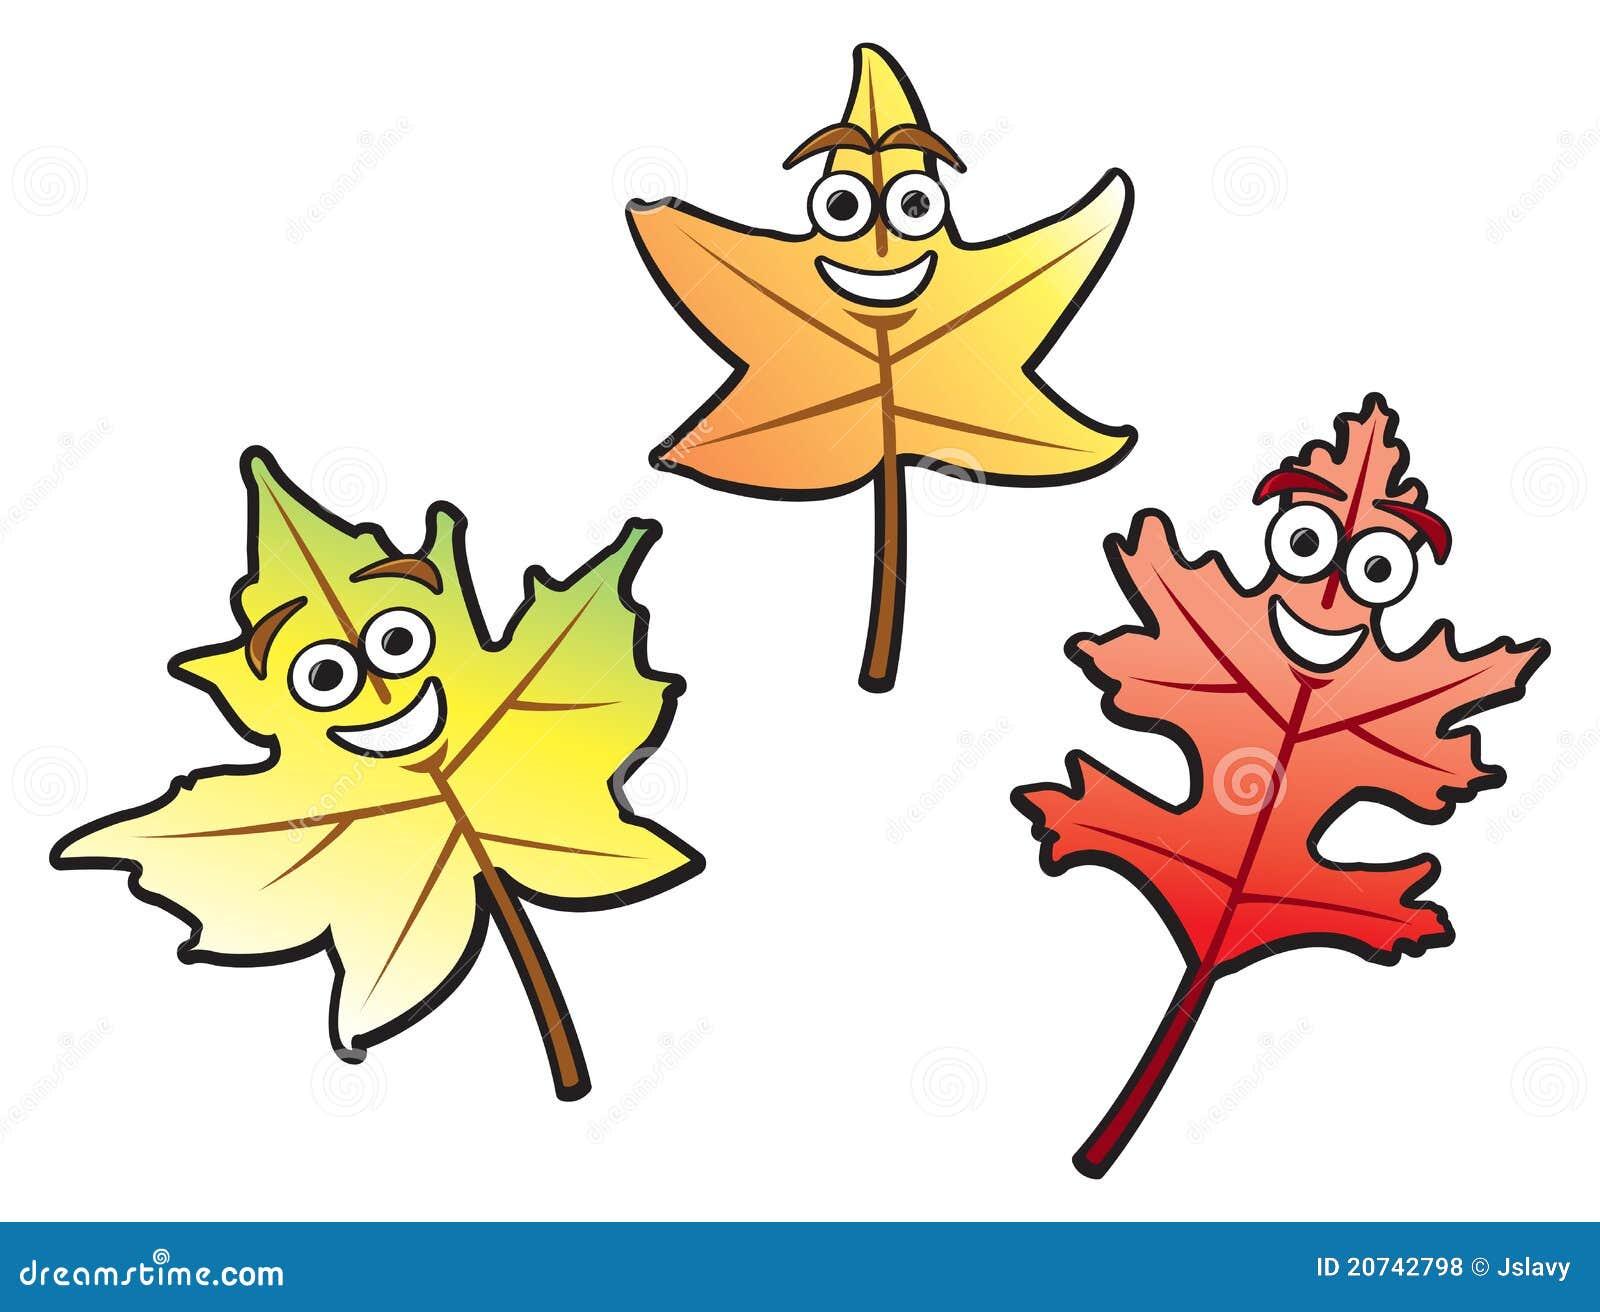 cartoon fall leaves stock vector illustration of leaves 20742798 rh dreamstime com fall leaf cartoon fall leaf cartoon pictures